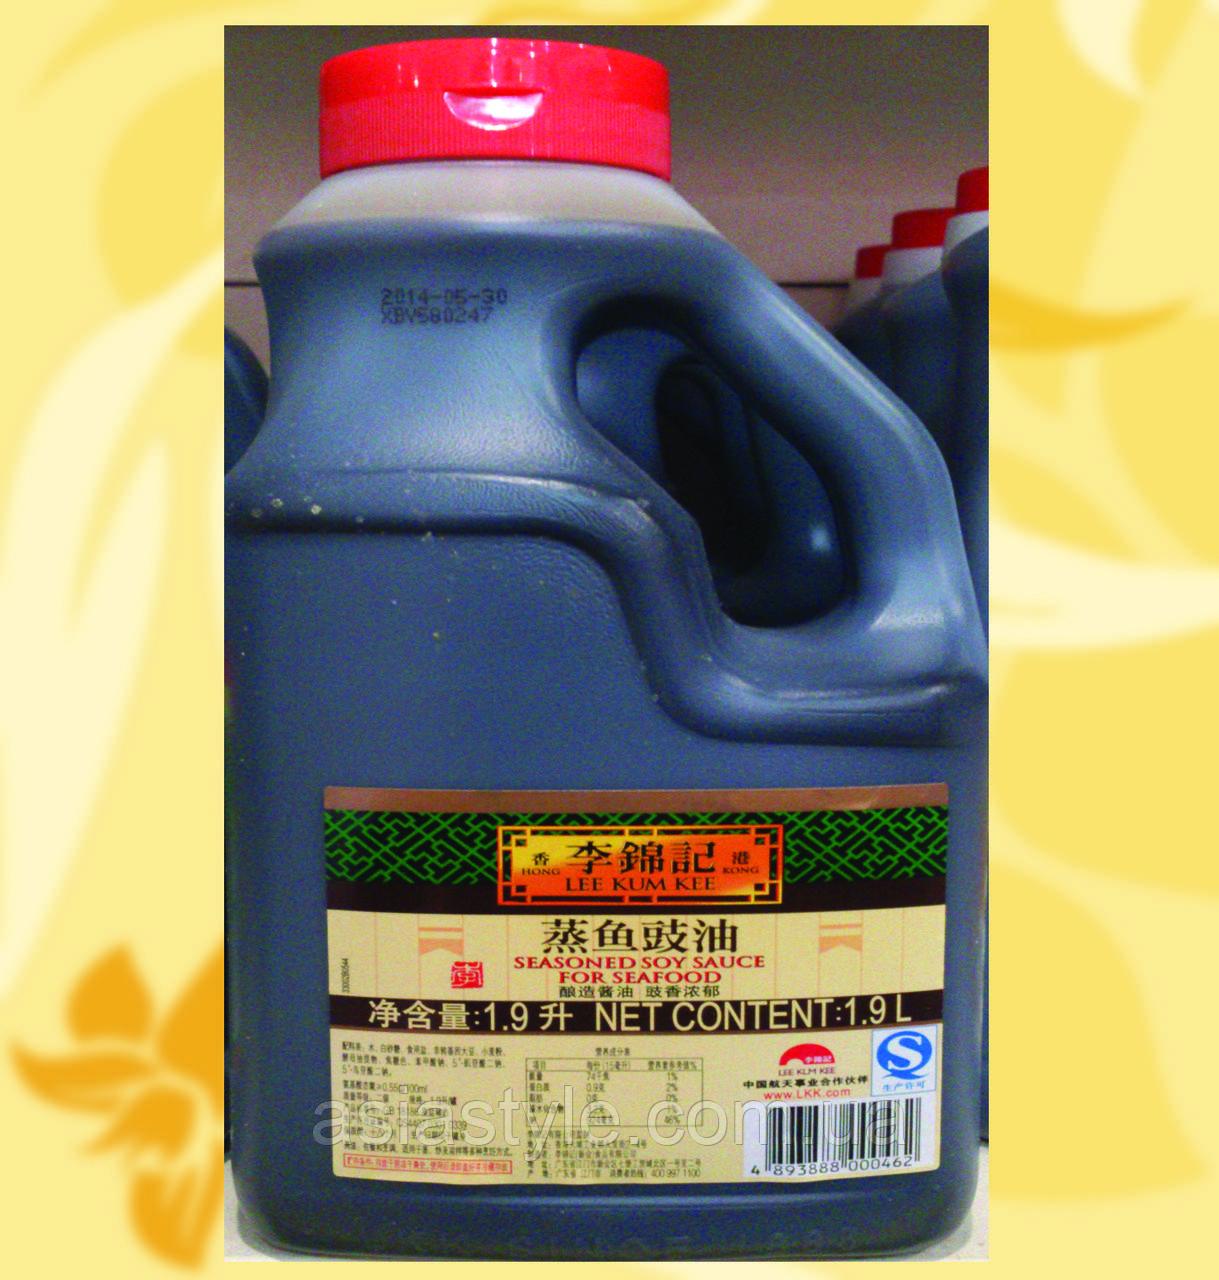 Соус соєвий для морепродуктів, Seasoned Soy Sauce for Seafood, Lee Kum Kee,Китай, 1,9 л, Ч